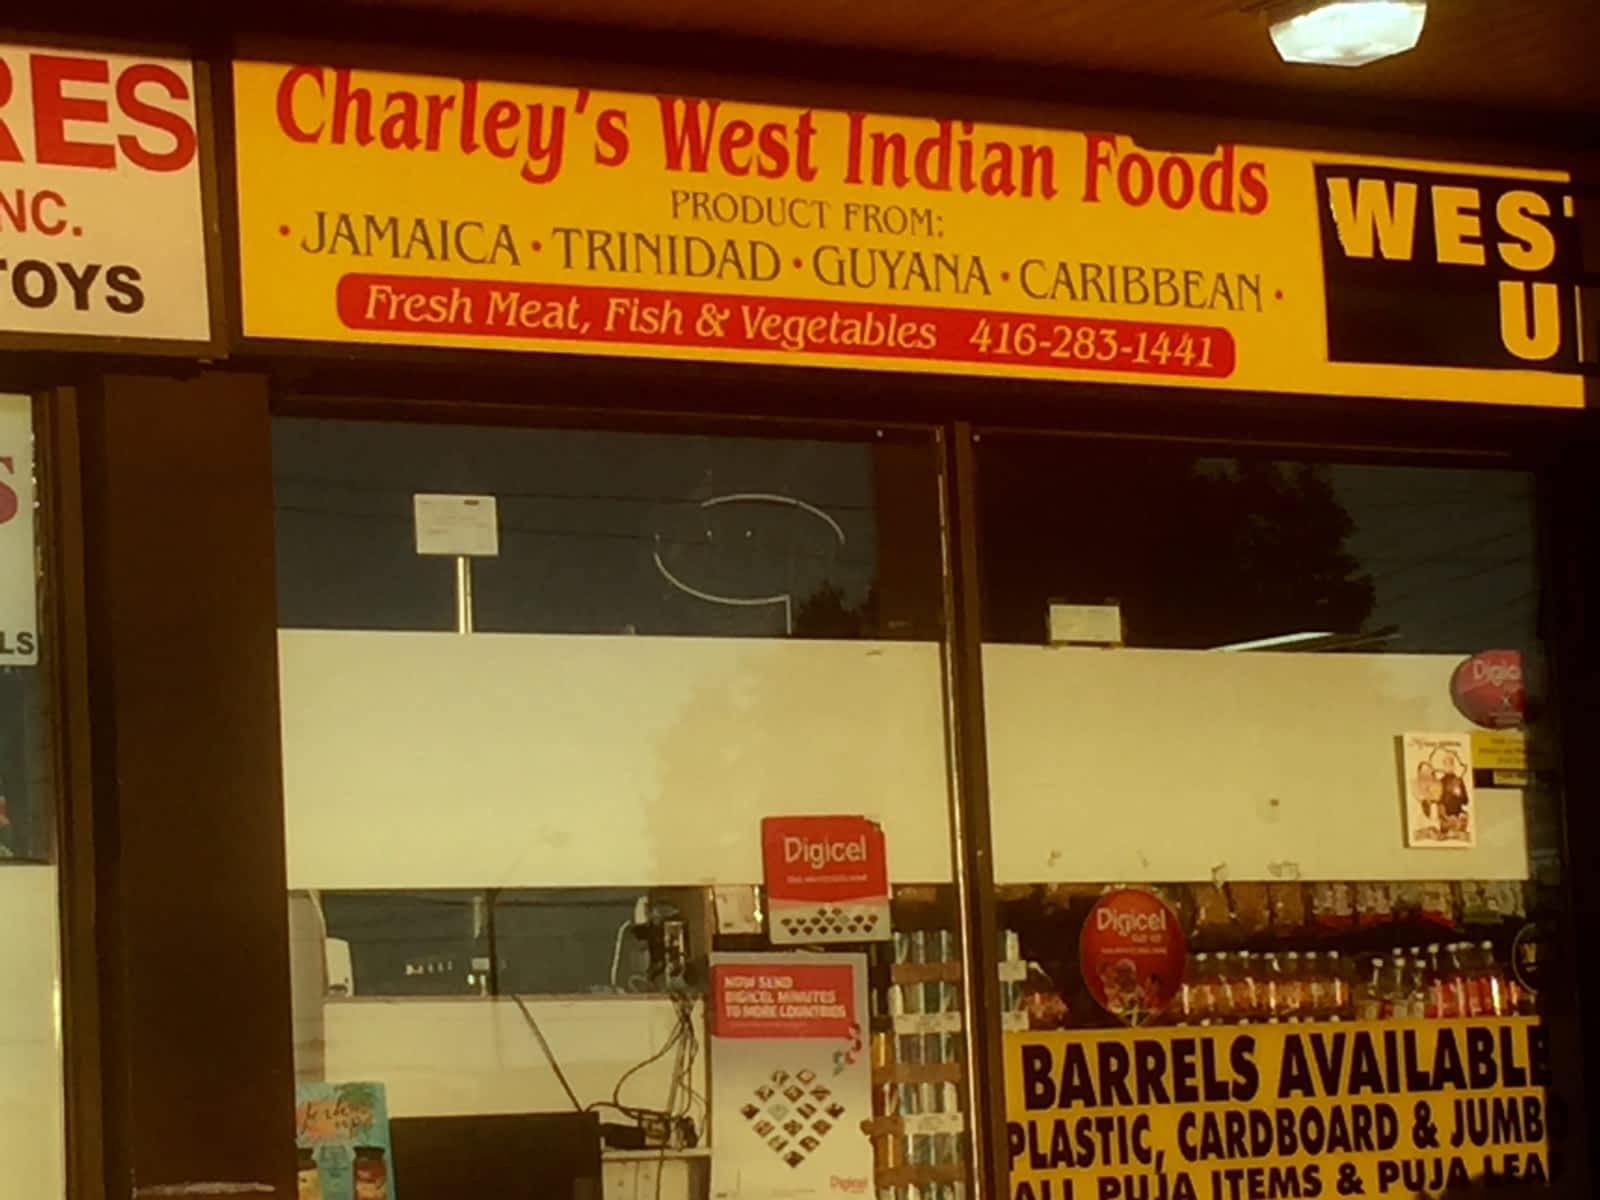 Charleys West Indian Foods - Opening Hours - 1154 Morningside Ave